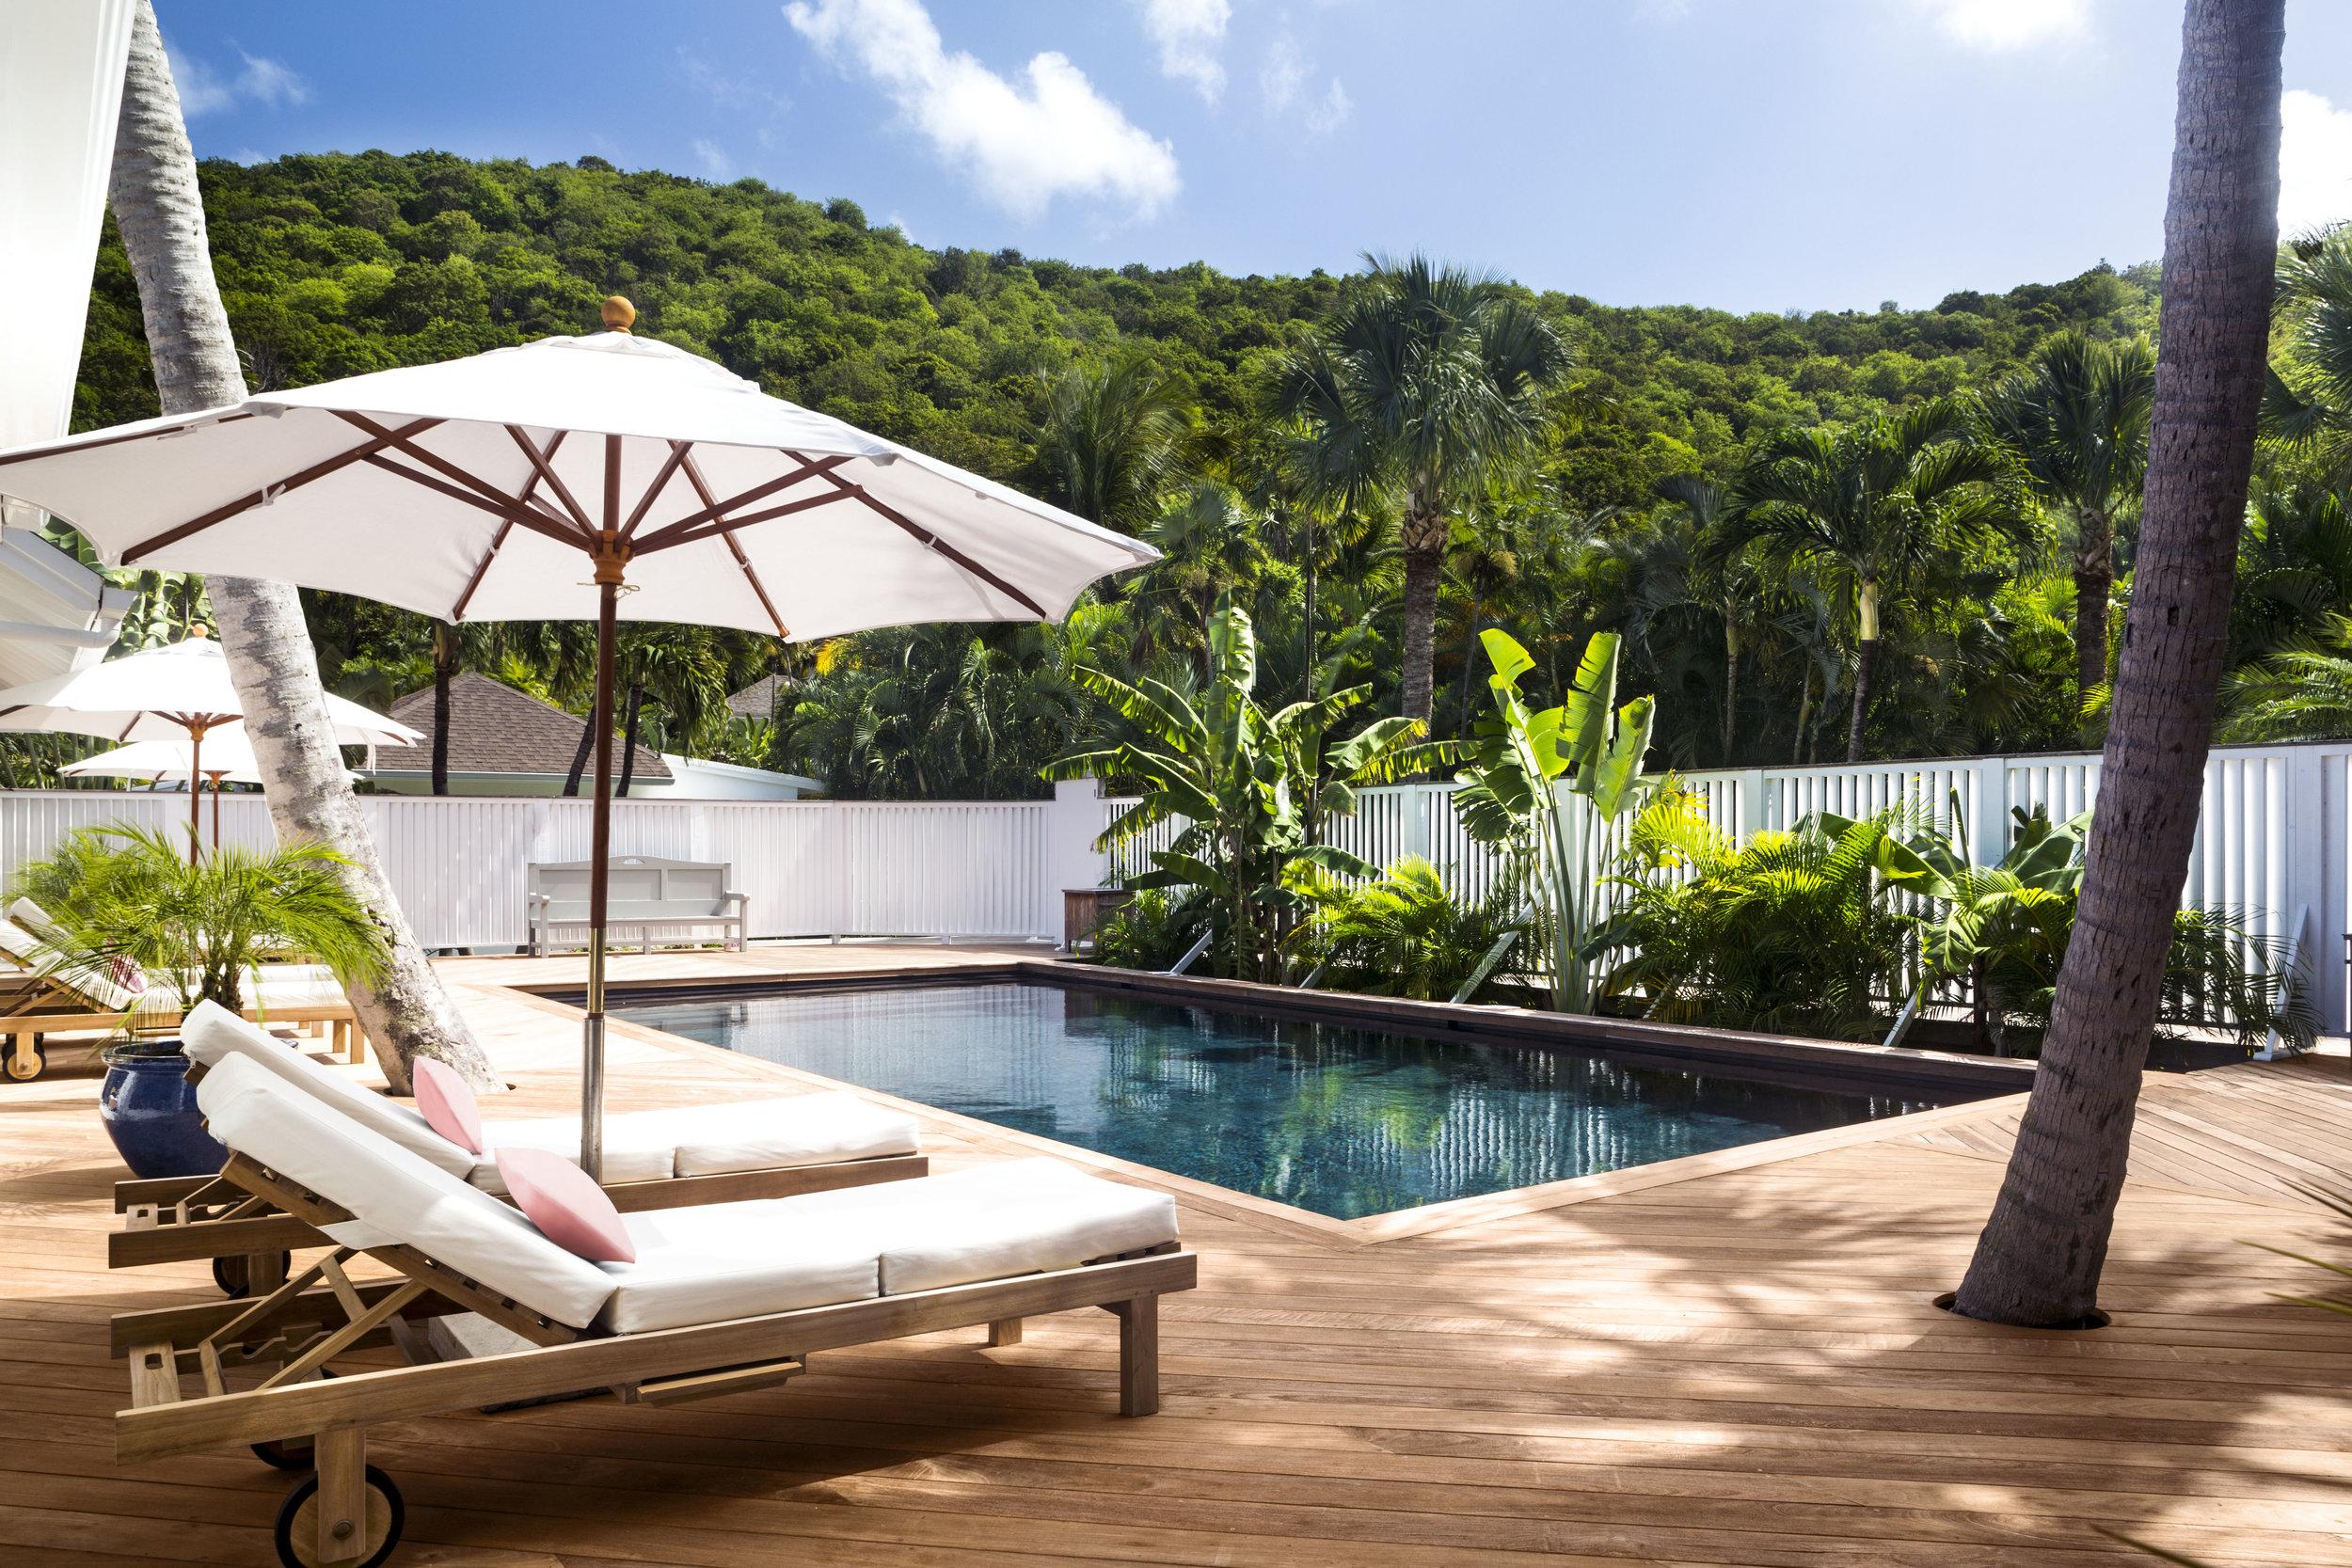 20180807032242_2-1-cheval-blanc-st-barth-isle-de-france-garden-bungalow-pool-s-candito.jpg